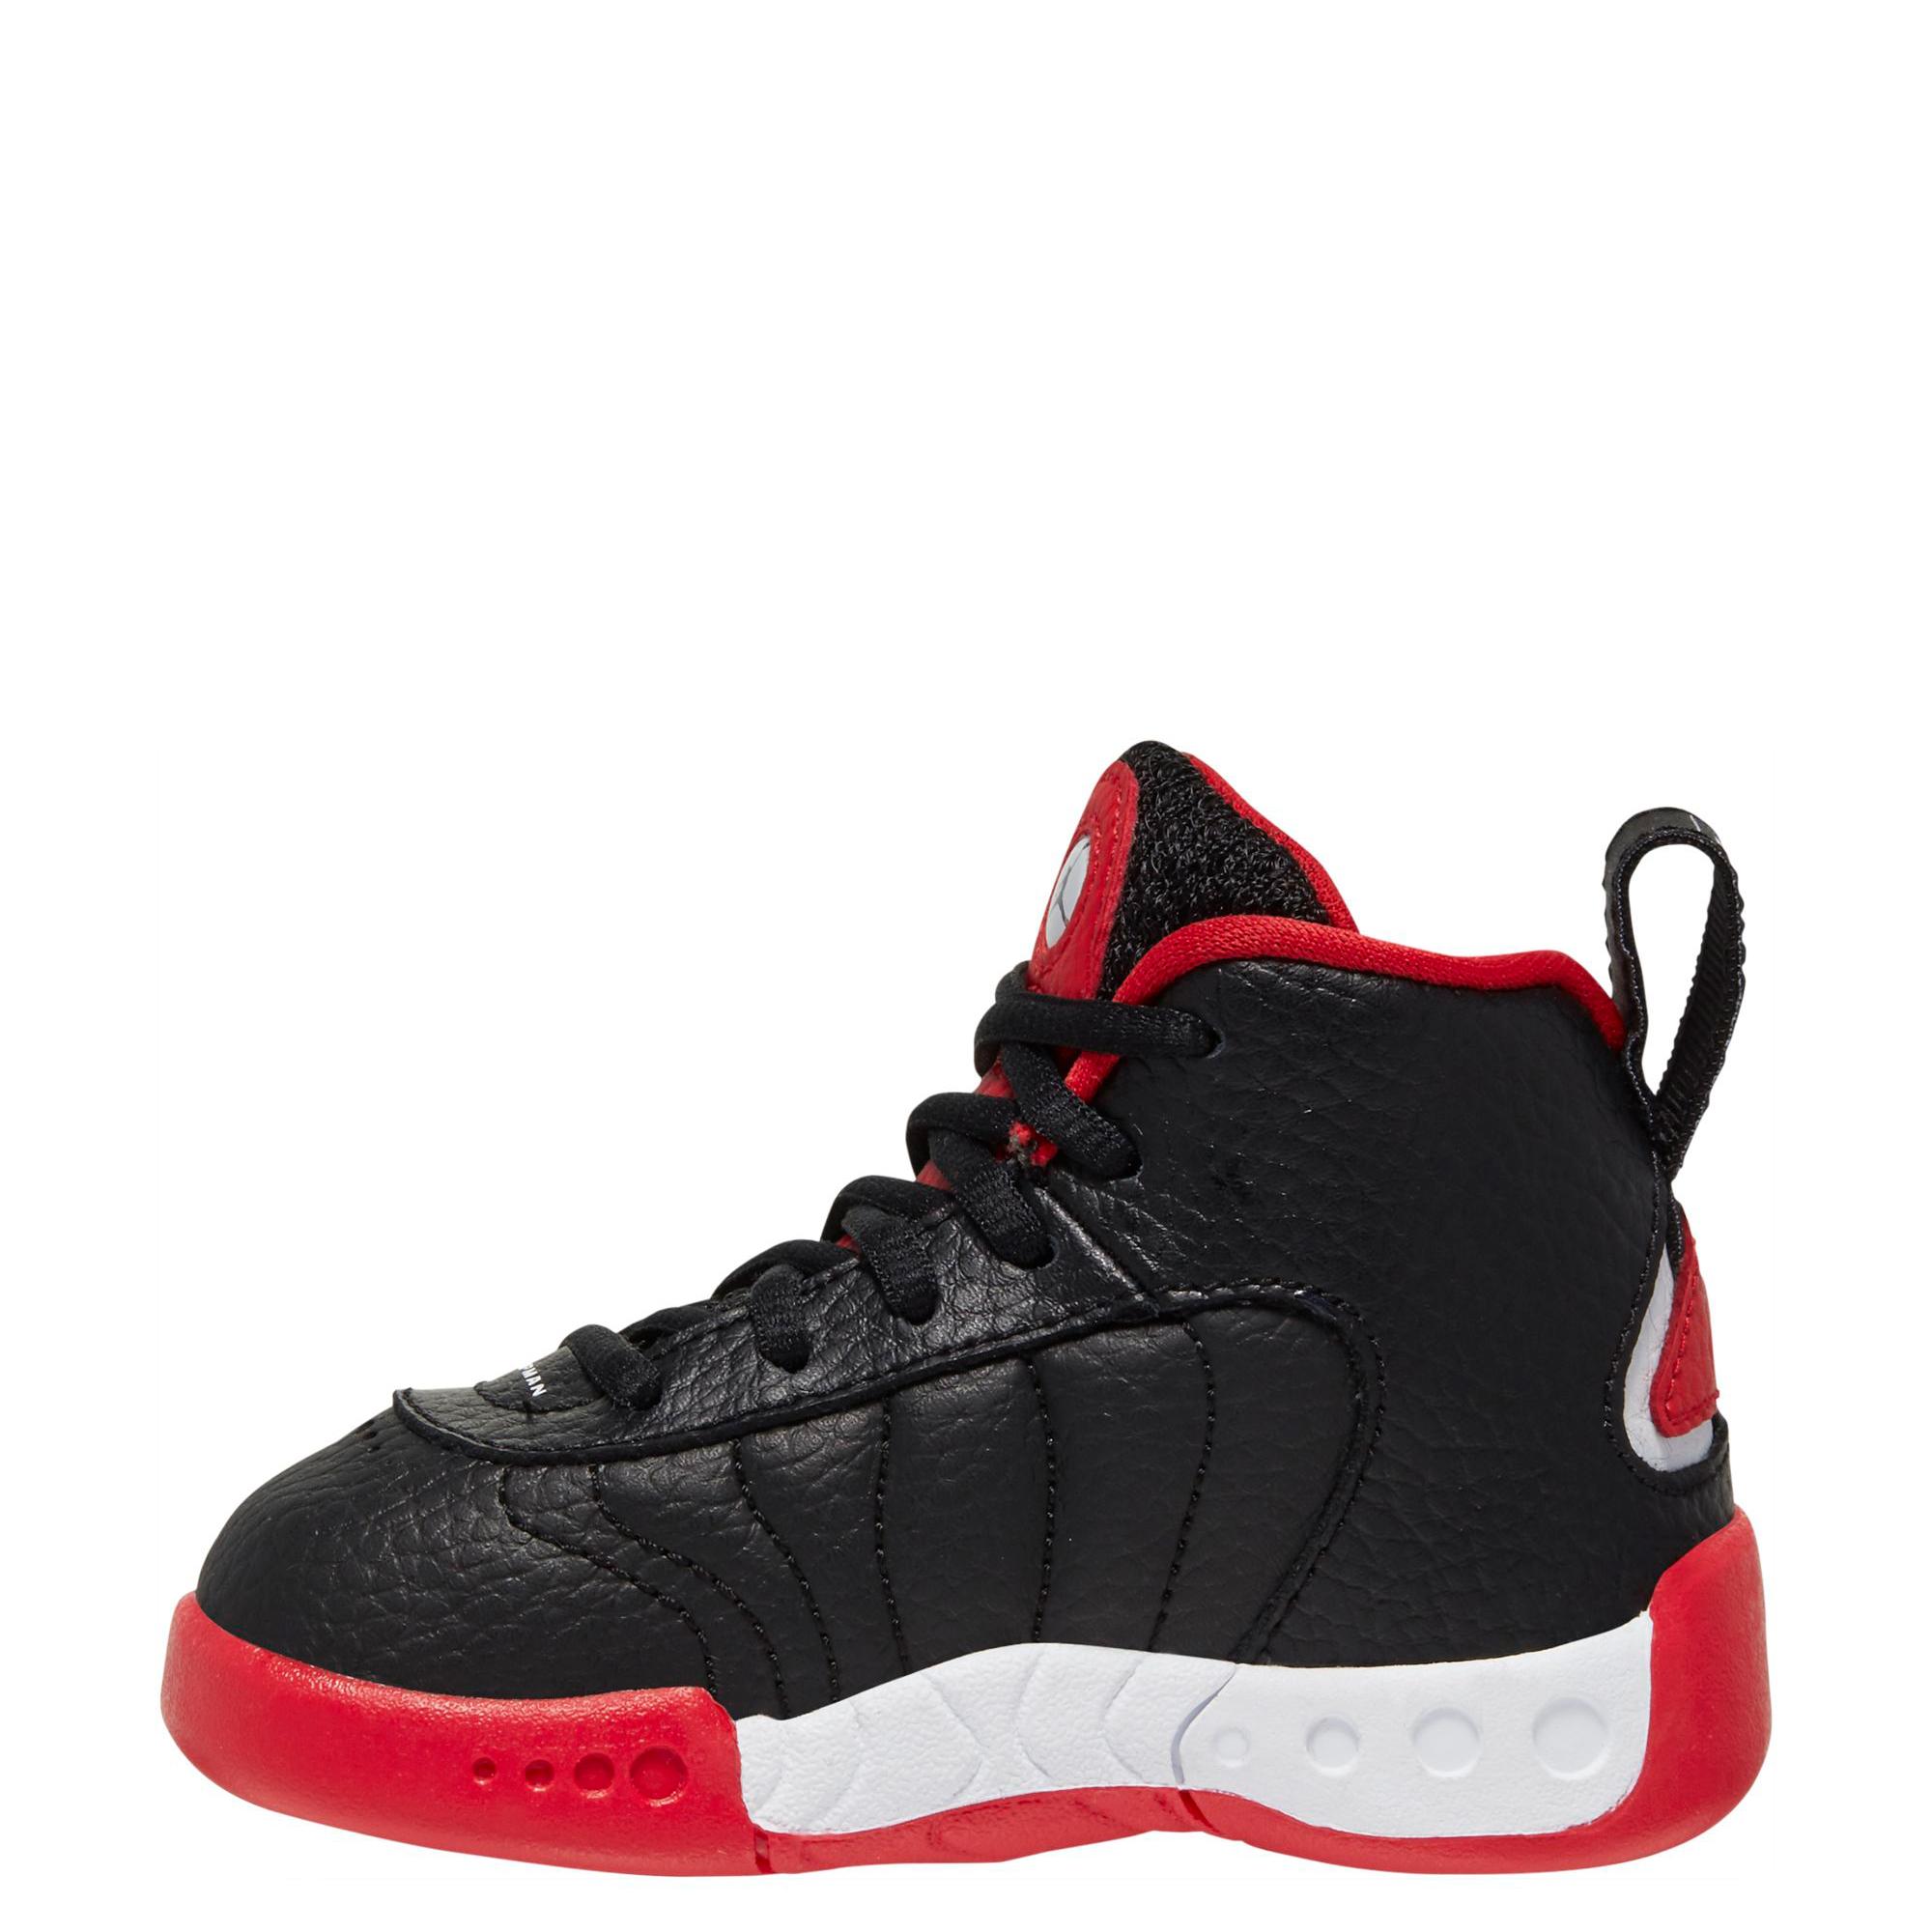 TD) Jumpman Pro Black/White-University Red